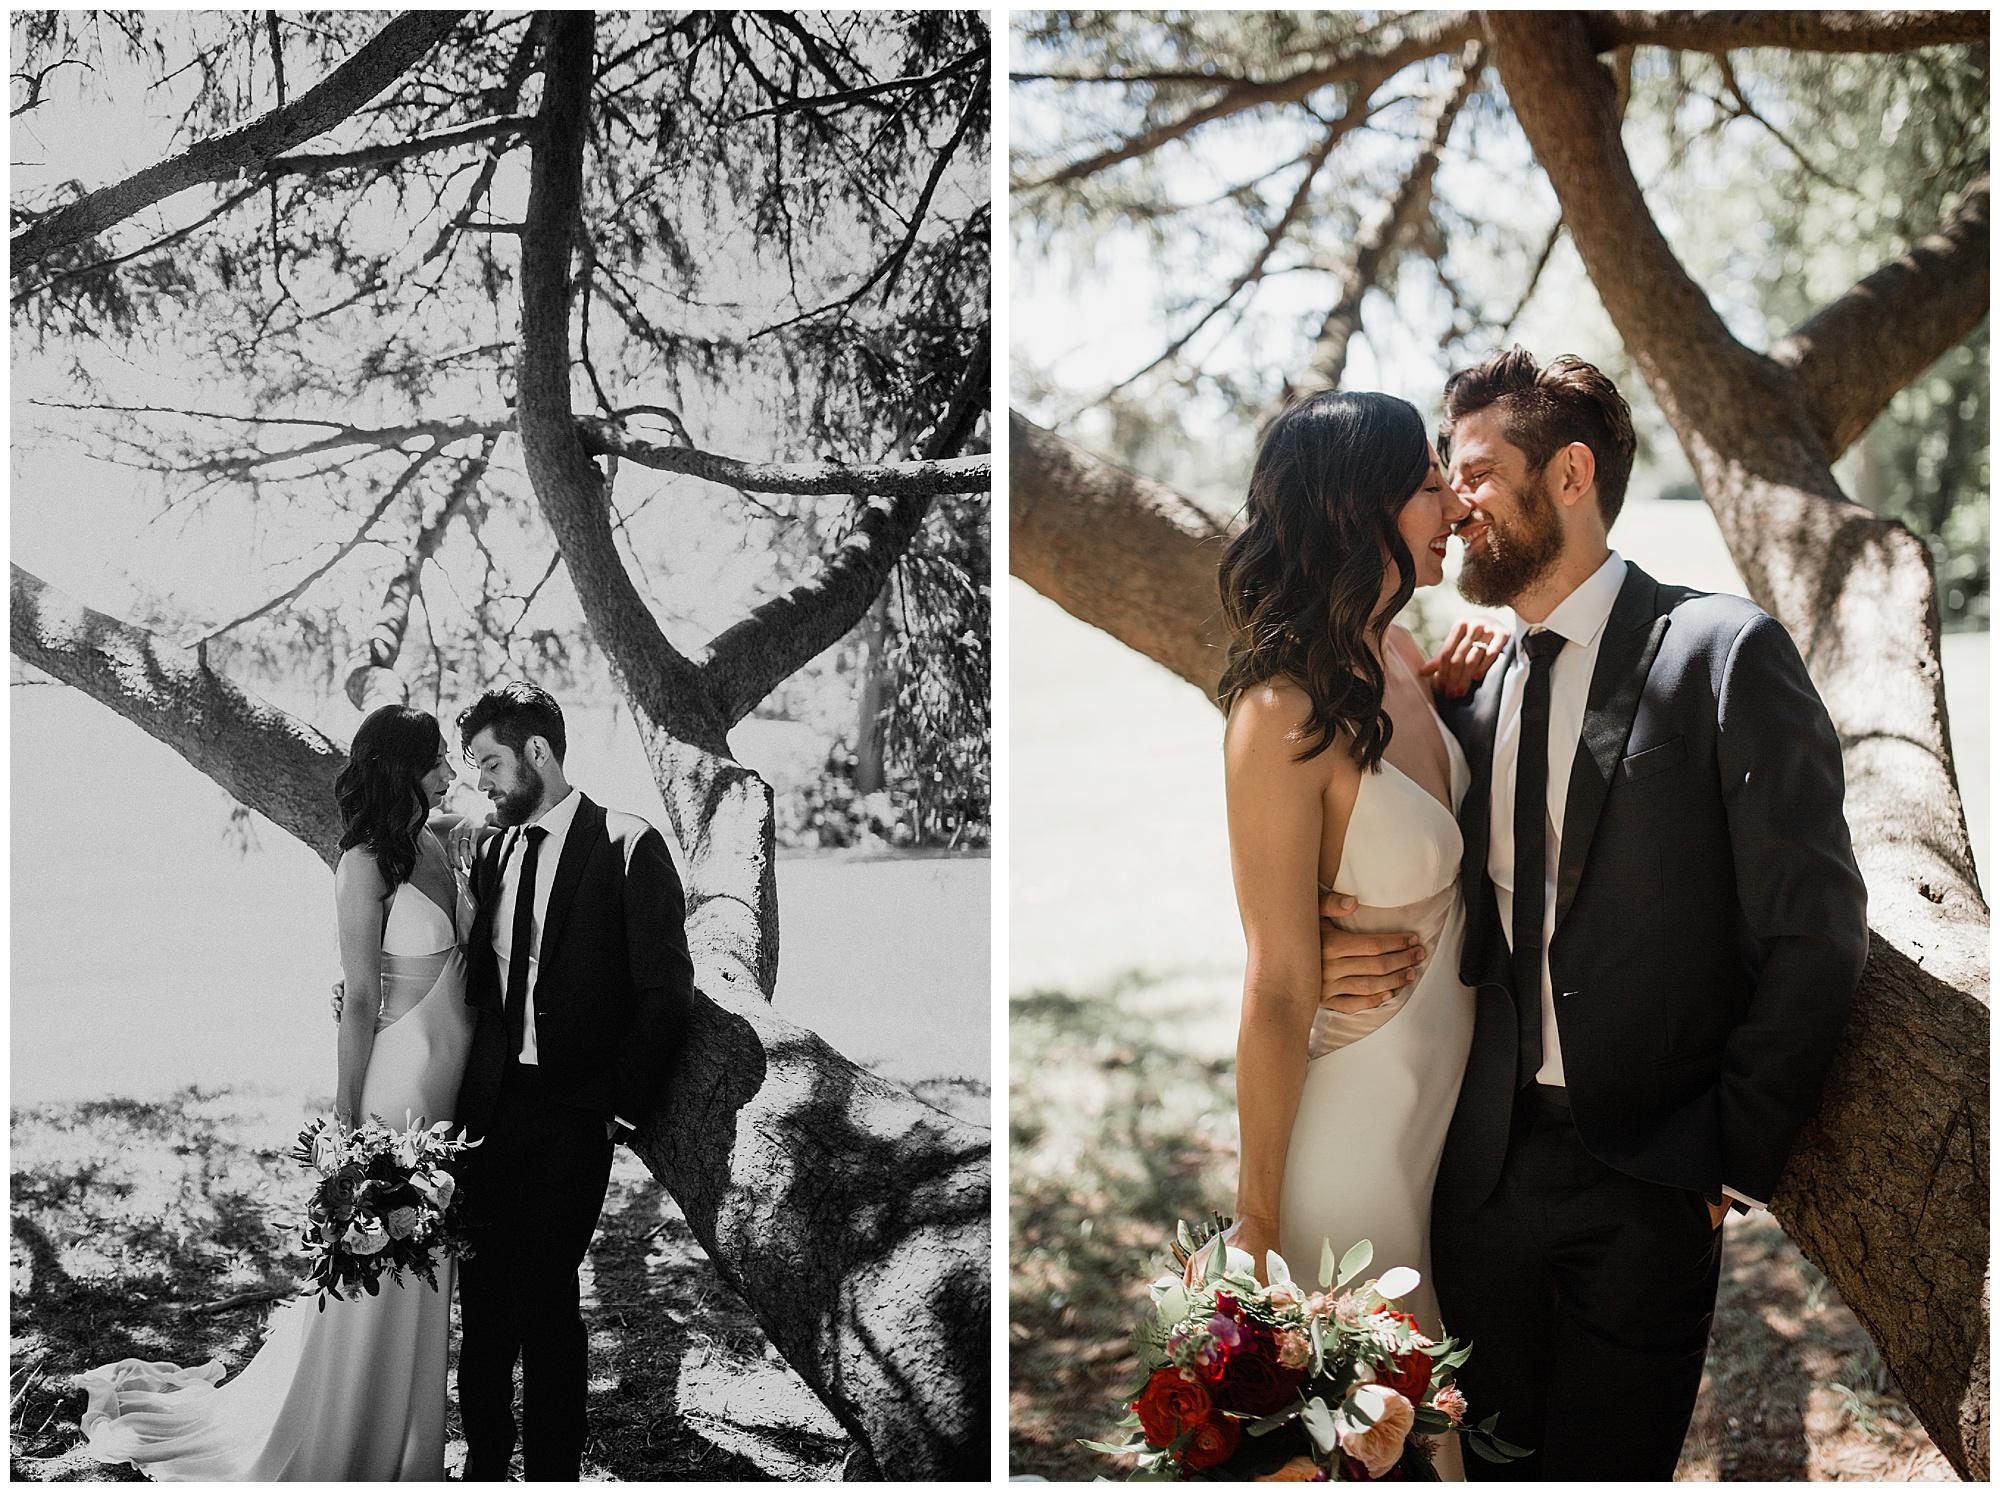 allerton_park_wedding_champaign_il_chicago_wright_photographs_ne_0021.jpg